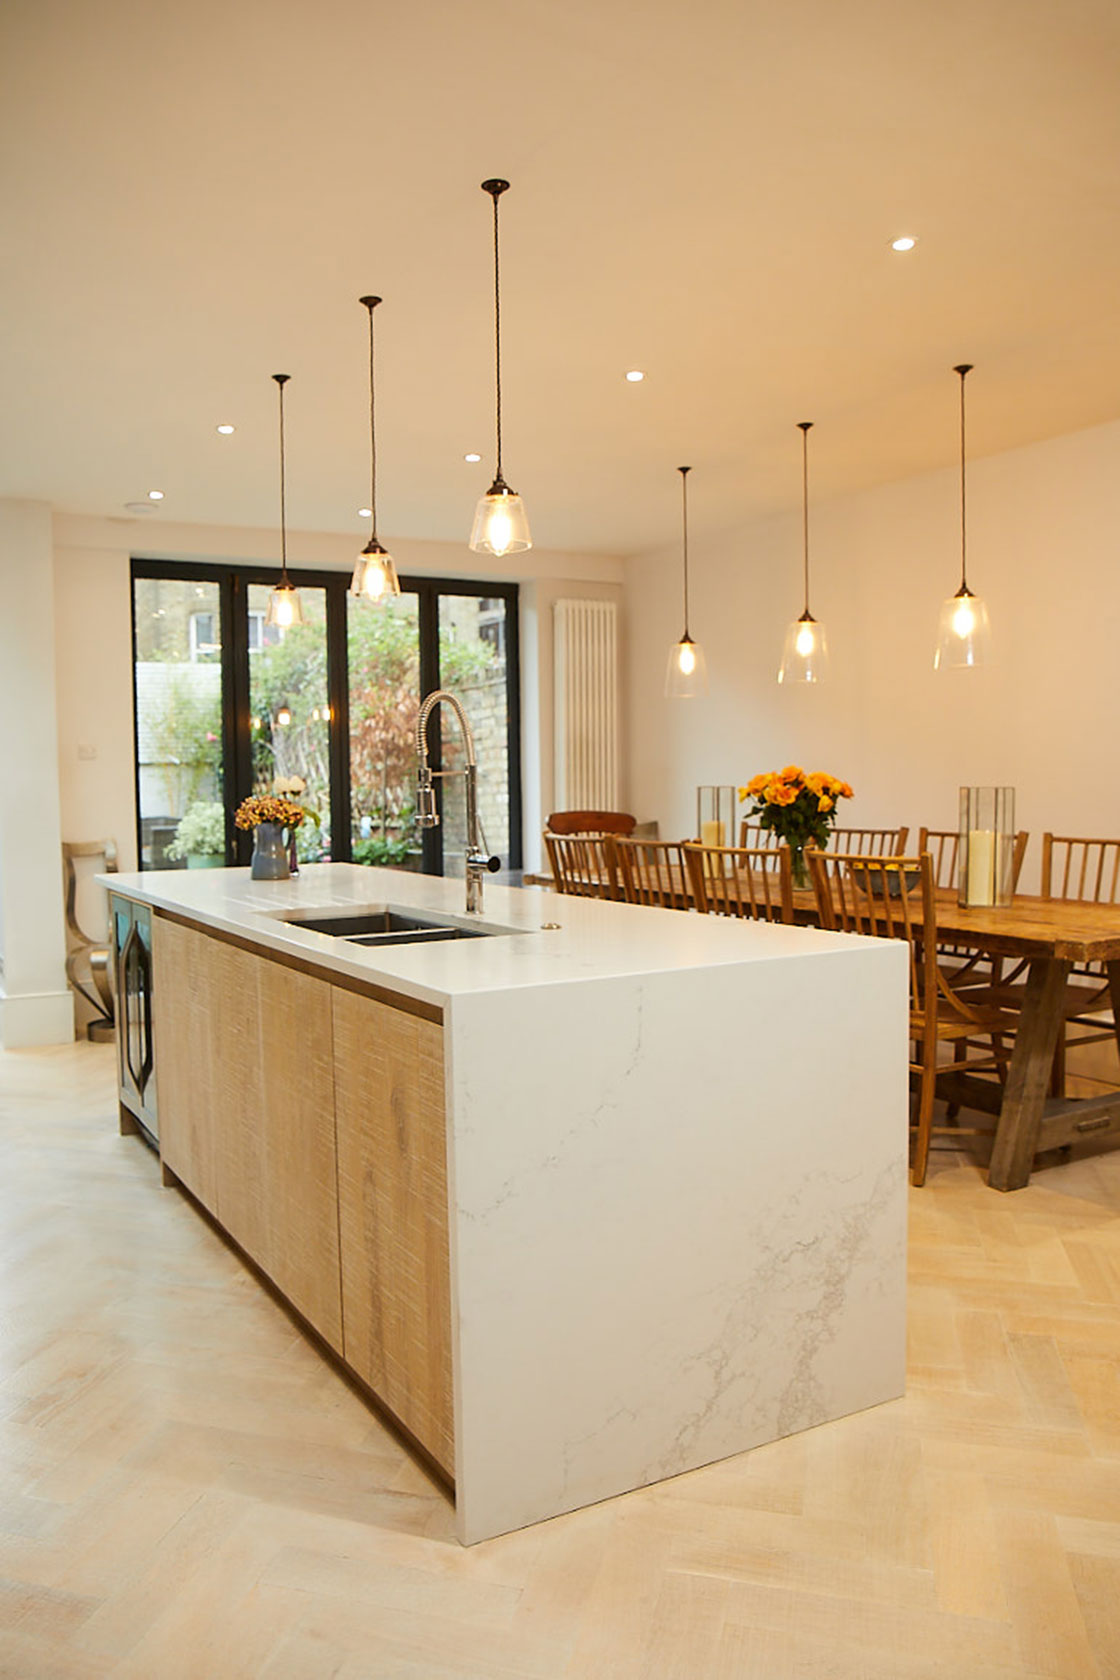 Limed oak engineered slab cabinet doors on kitchen island with quartz Caesarstone white worktop